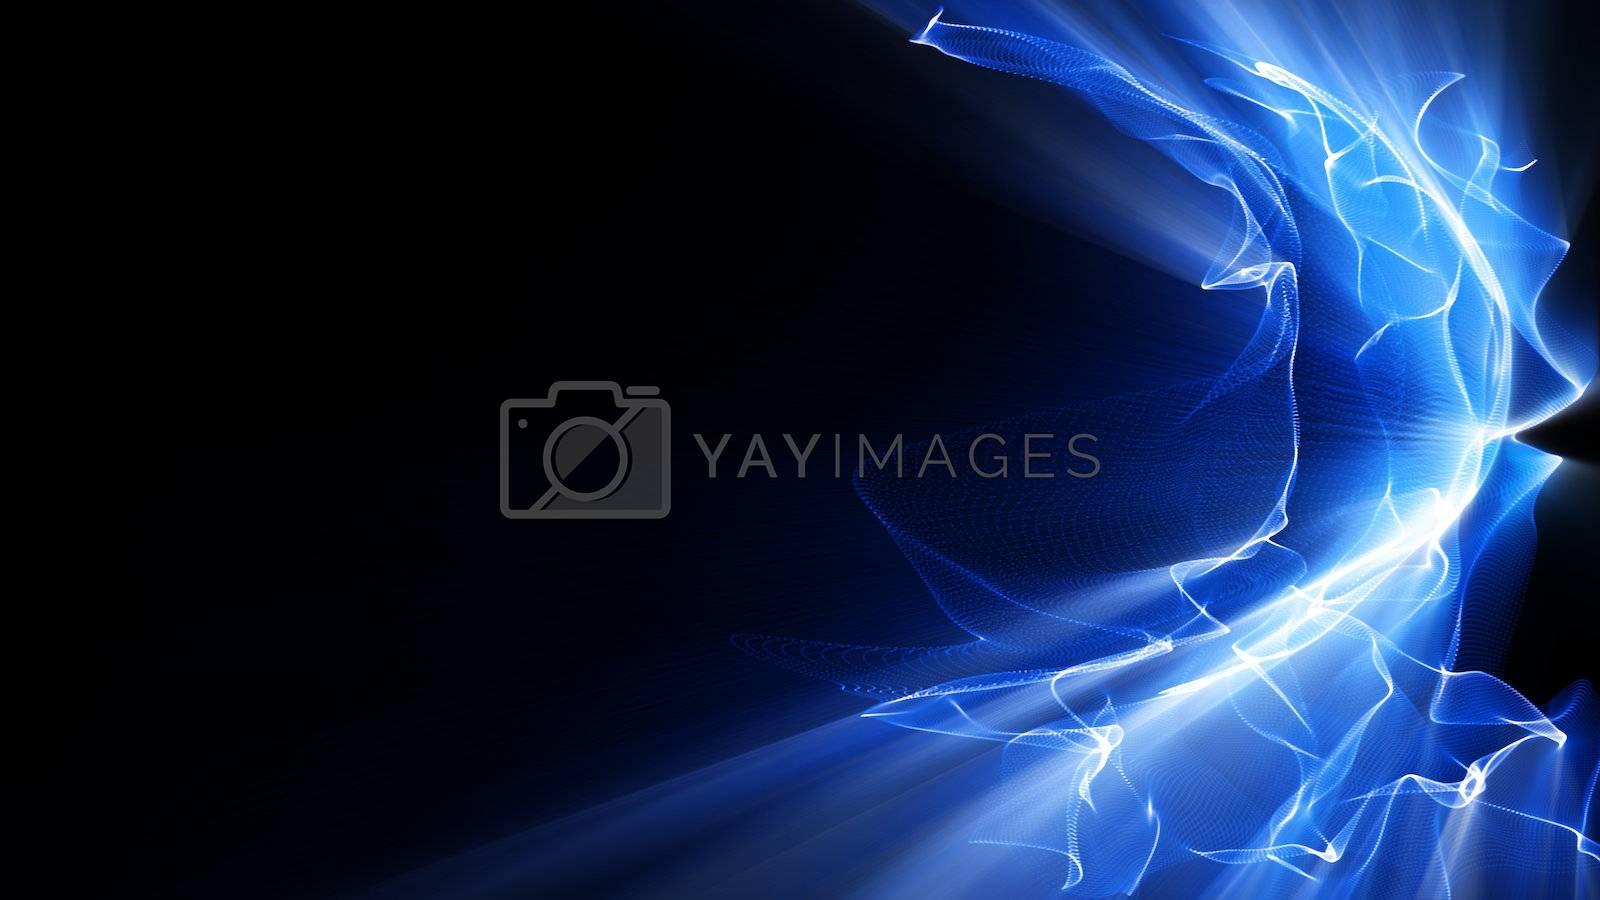 Light Effect 0392 - Waves of blue light undulate, ripple and shine.